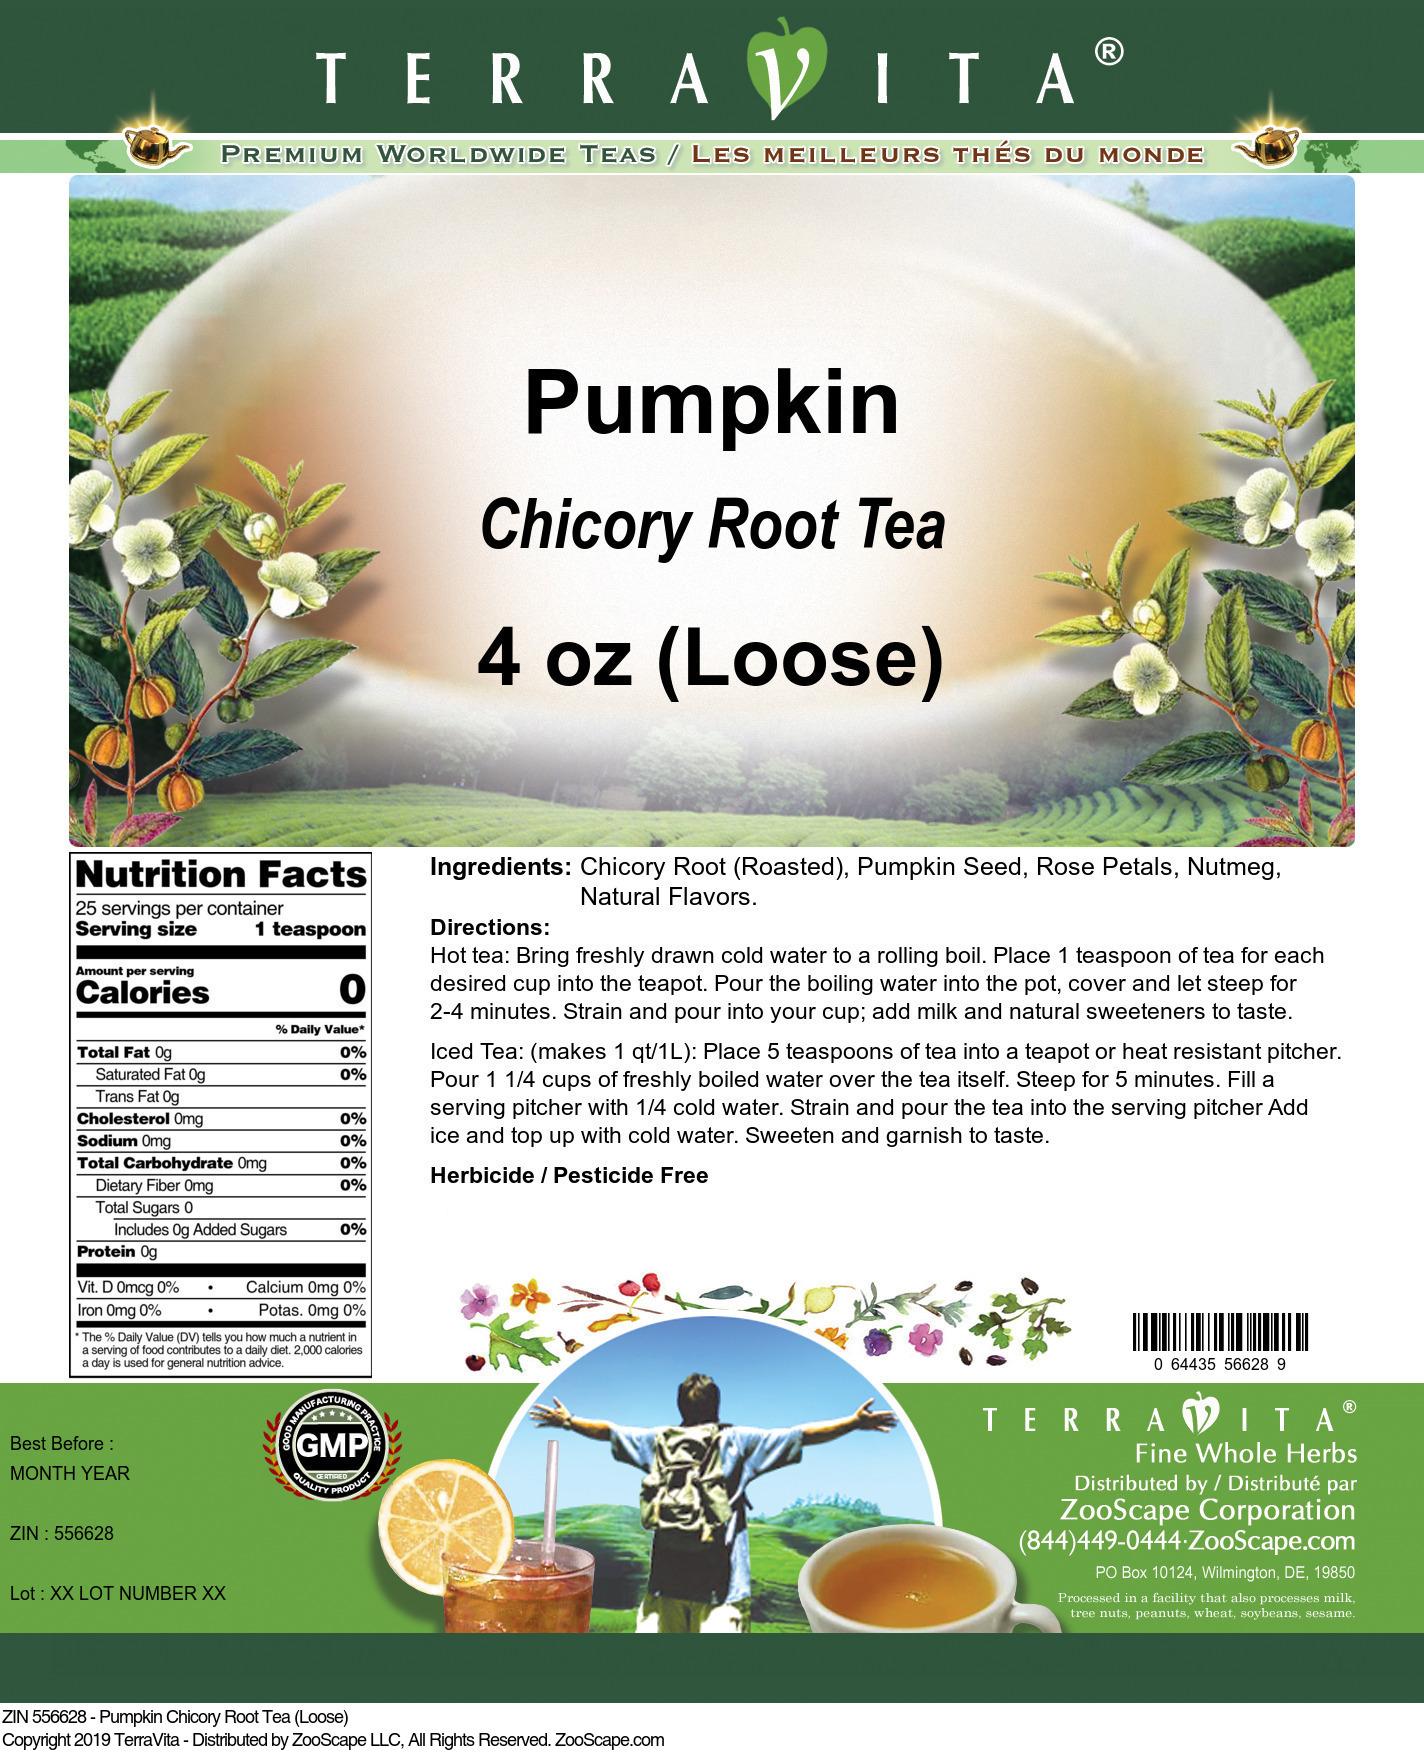 Pumpkin Chicory Root Tea (Loose)